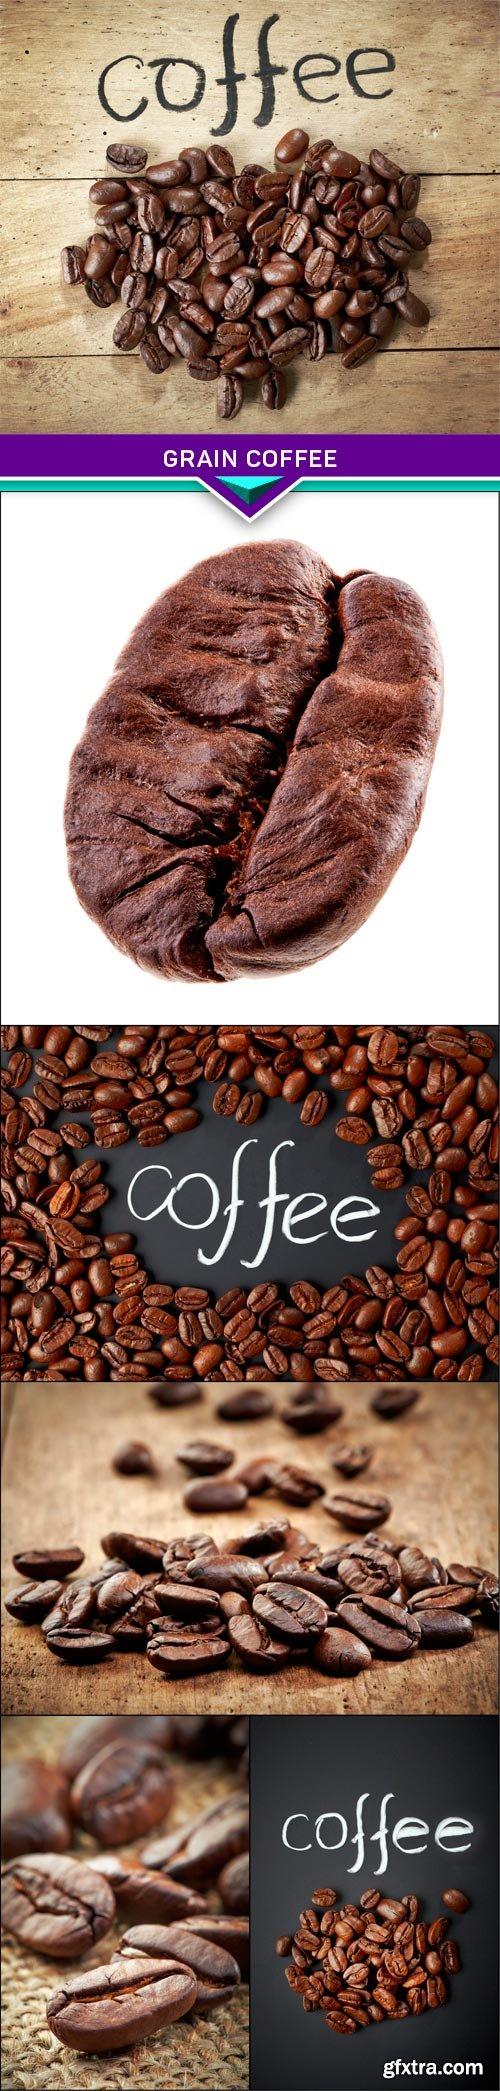 Grain coffee 6x JPEG